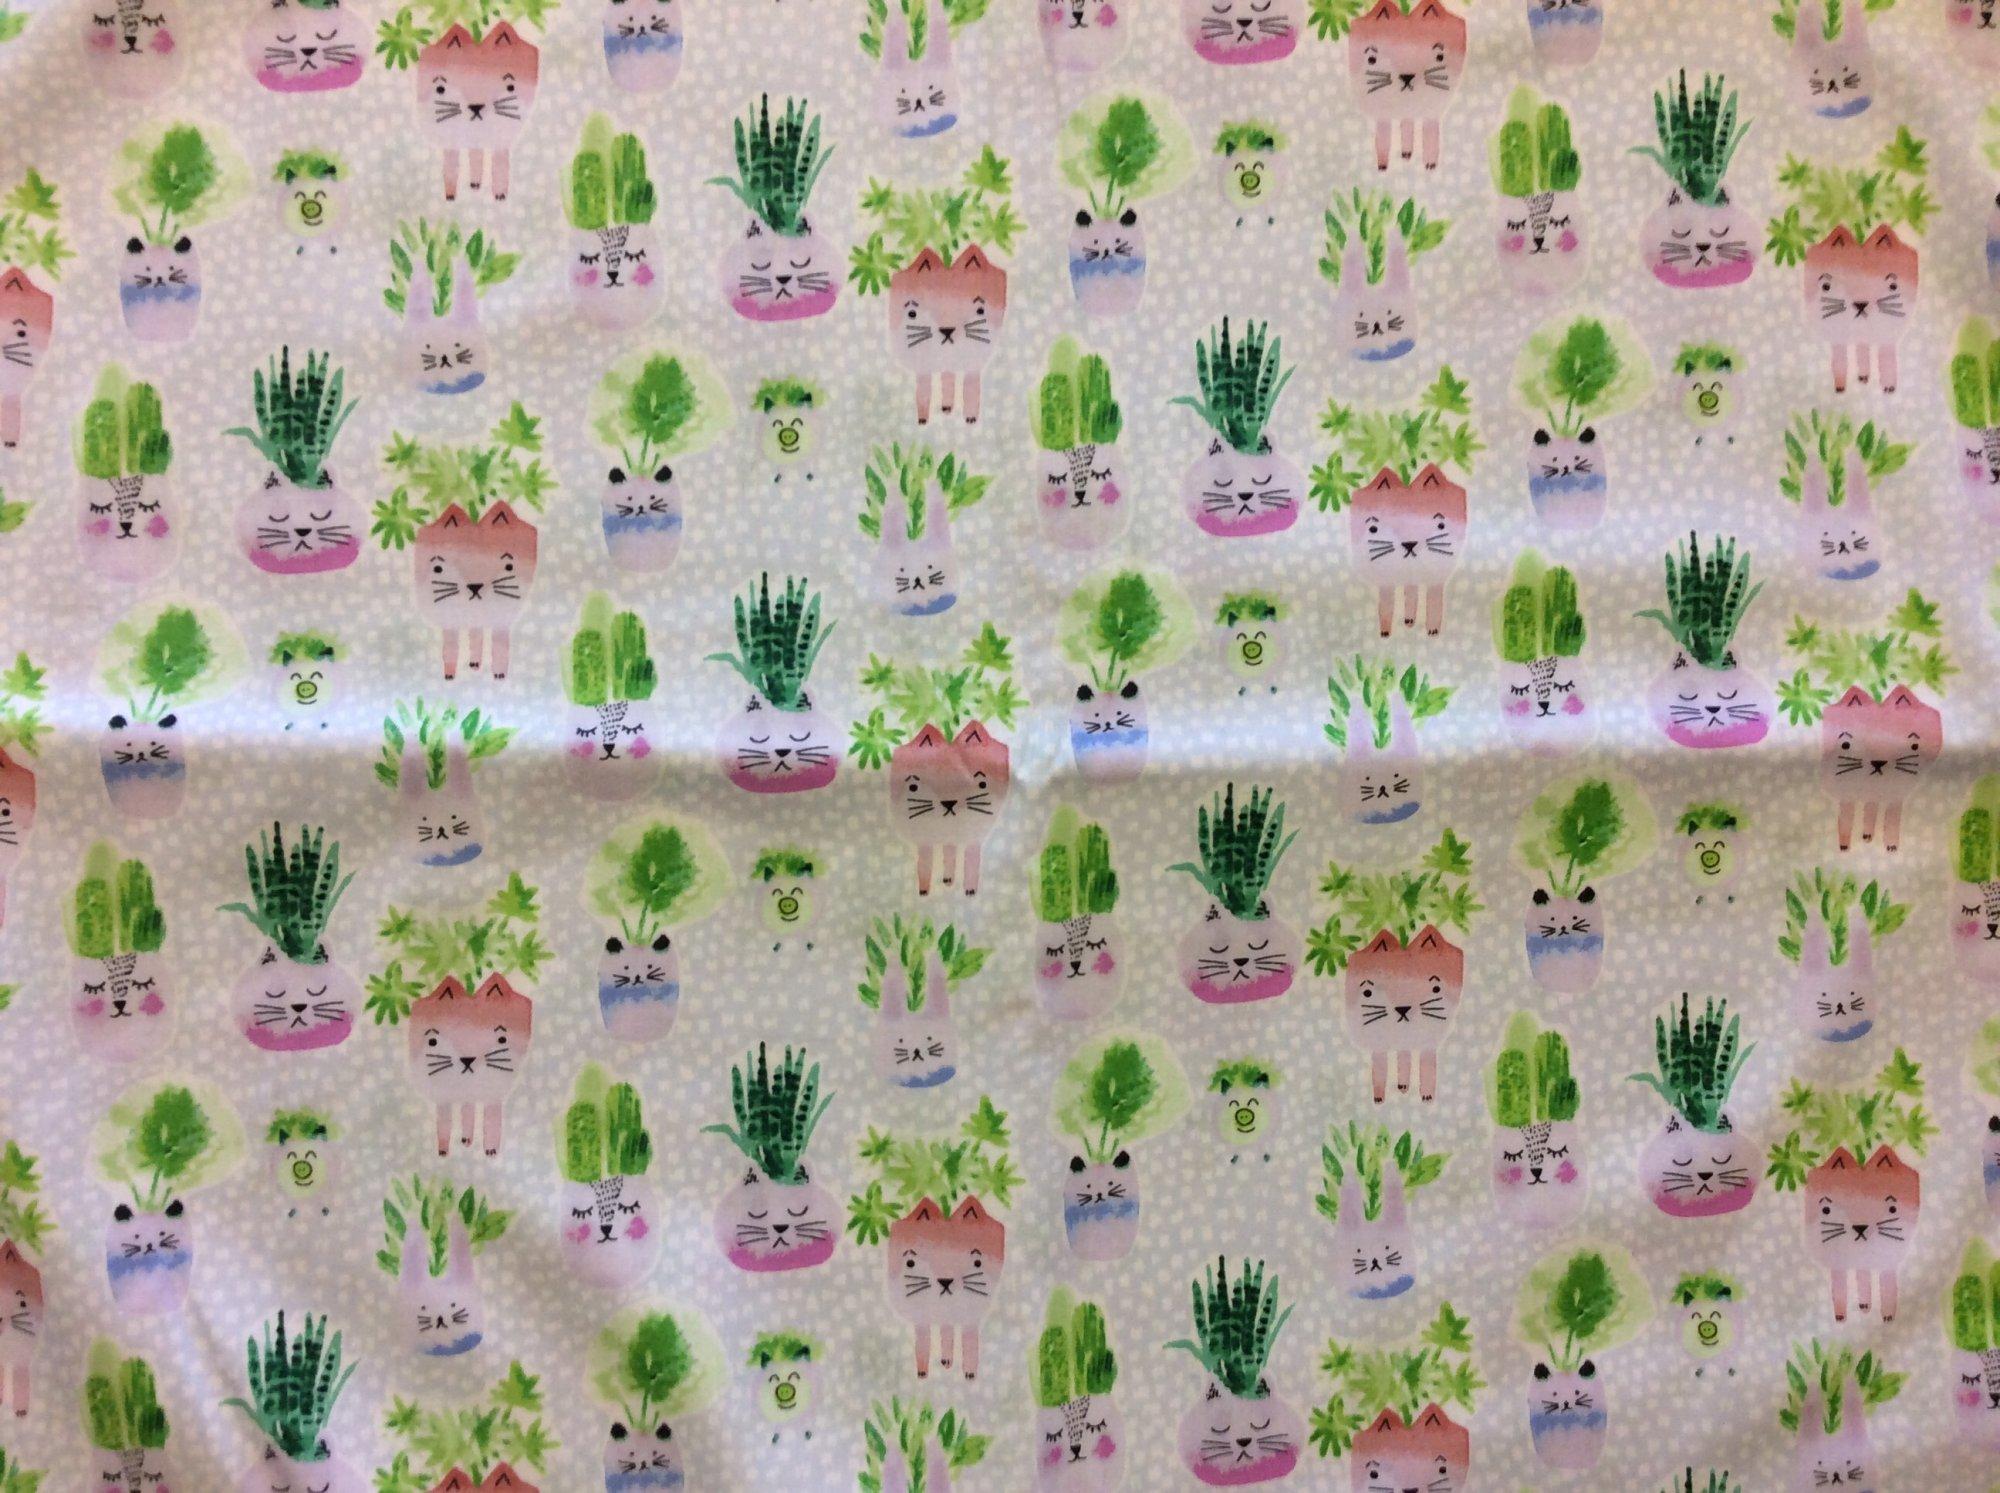 Dear Stella Cat Planter Succulent Plant Garden Planting Kitty Cute Novelty Cotton Quilting Fabric  HOP003